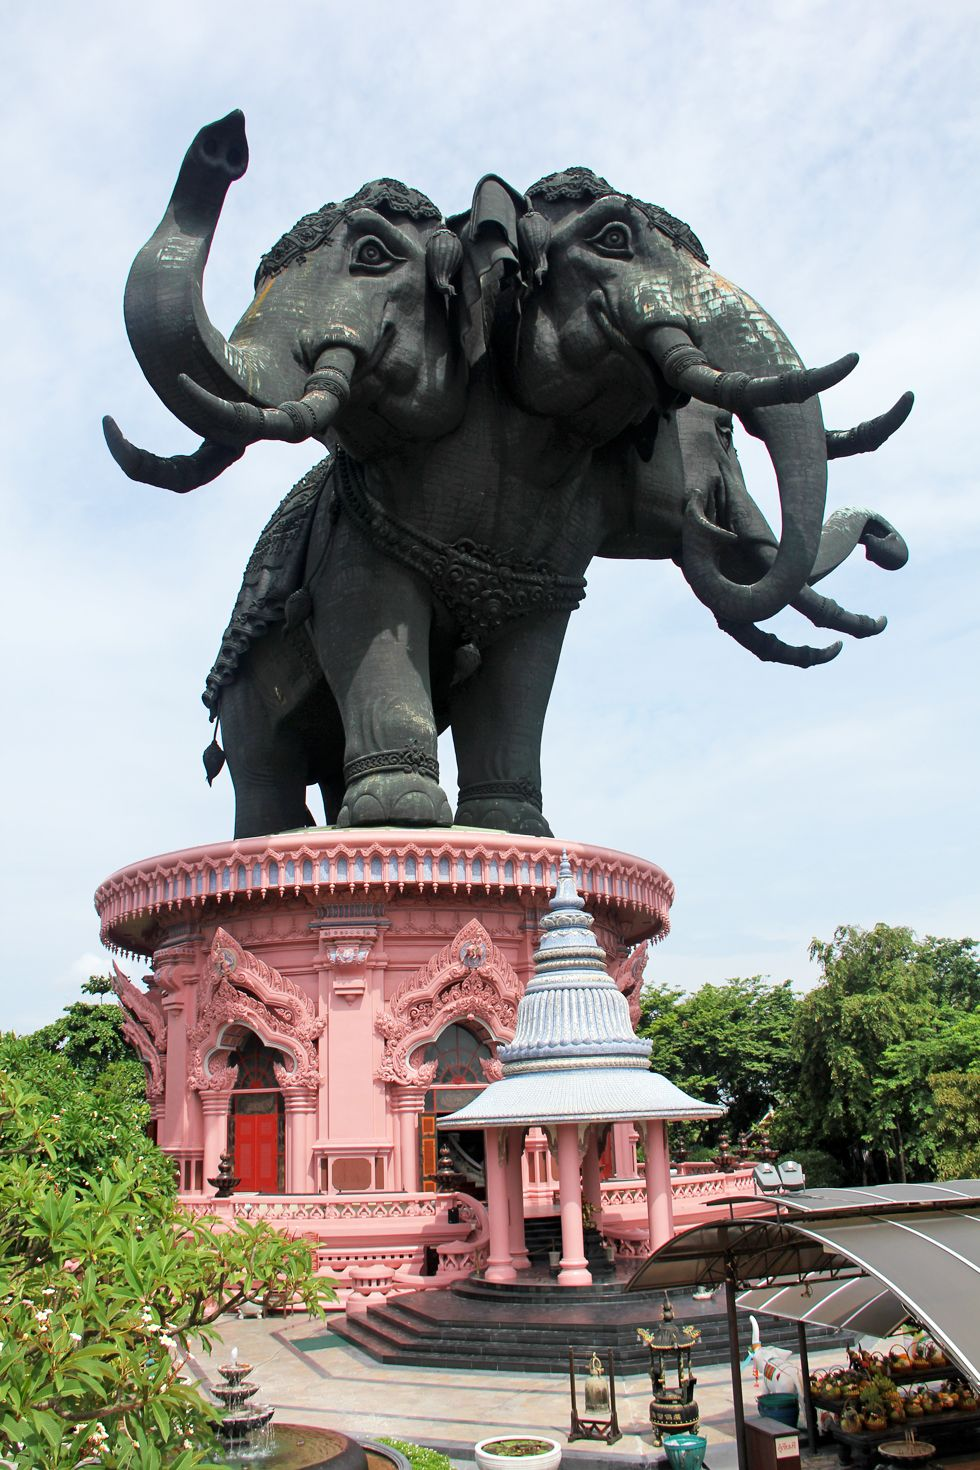 Giant elephants at the entrance to Erawan Museum in Bangkok, Samut Prakan, Thailand